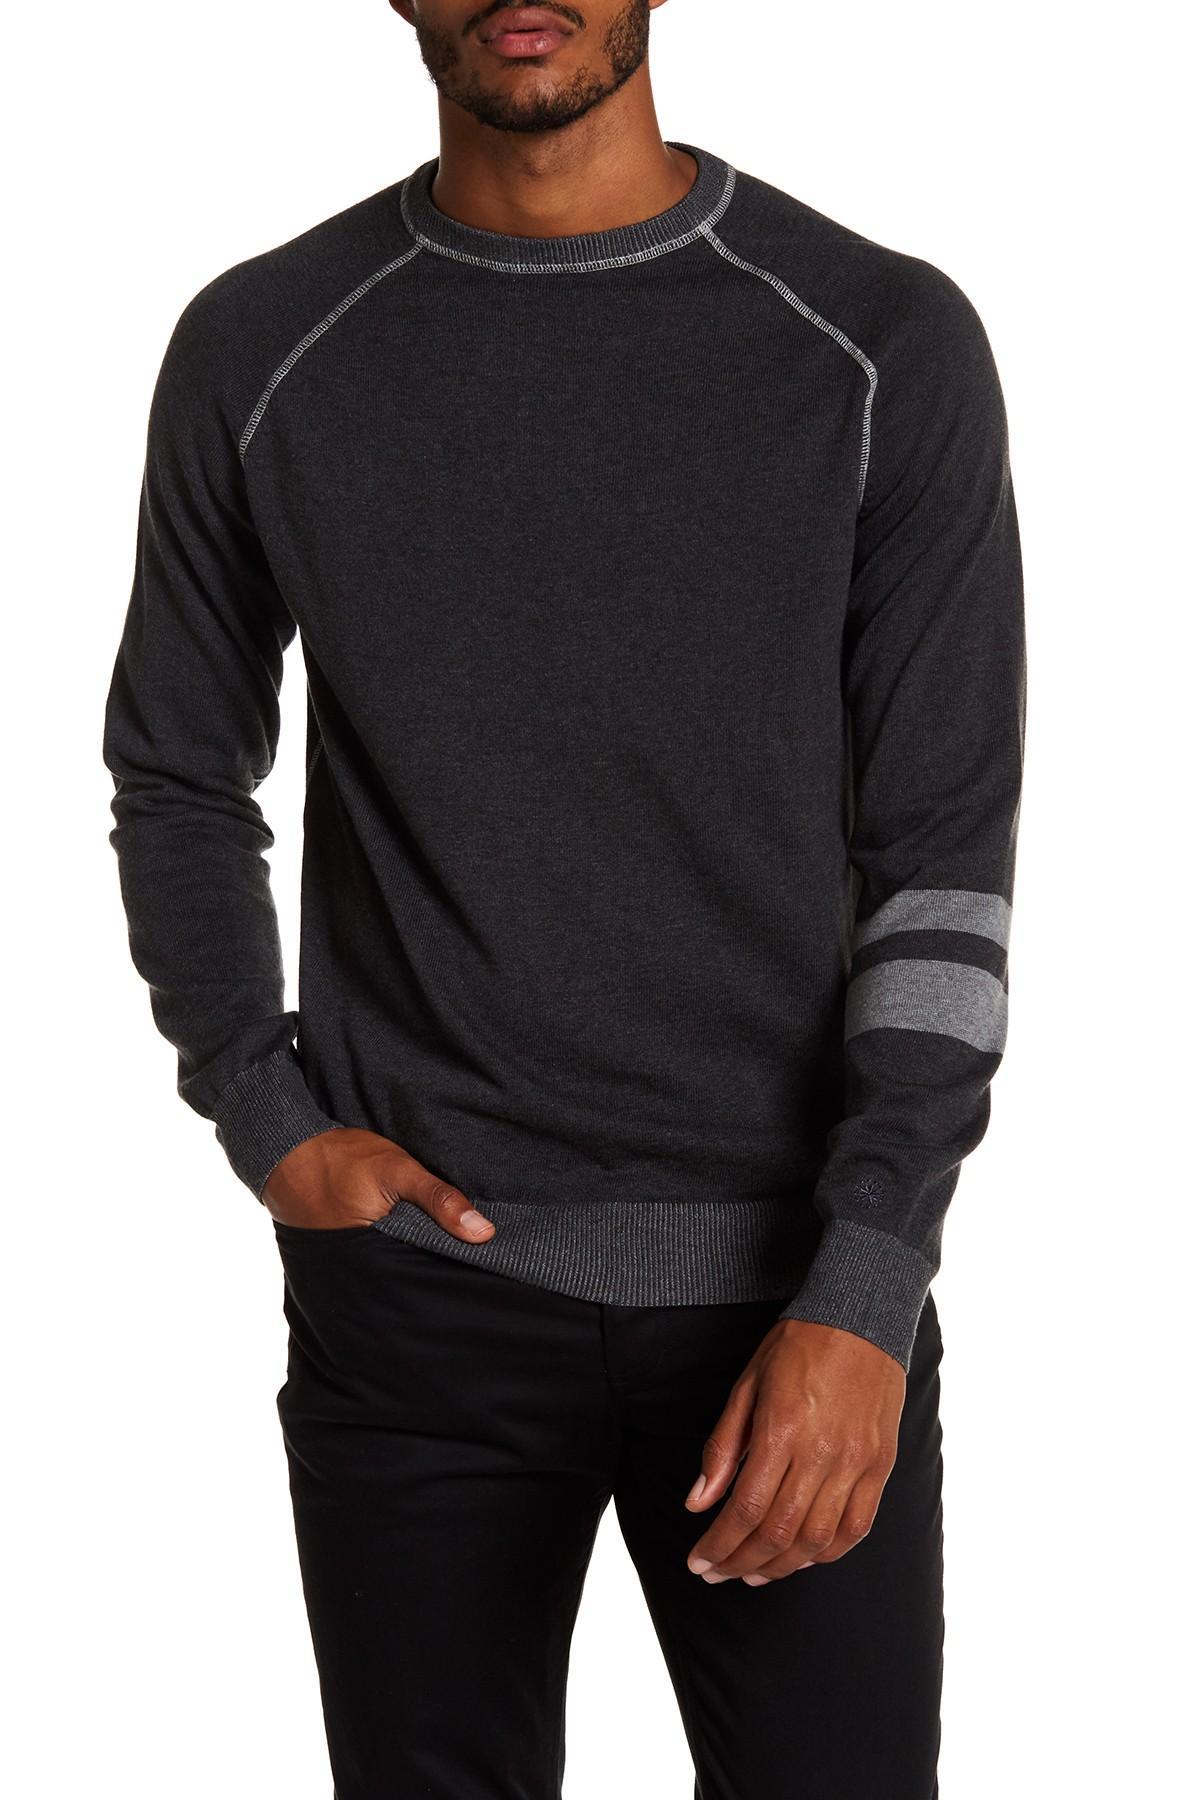 Agave Folsom Raglan Crew Neck Sweater in Gray for Men